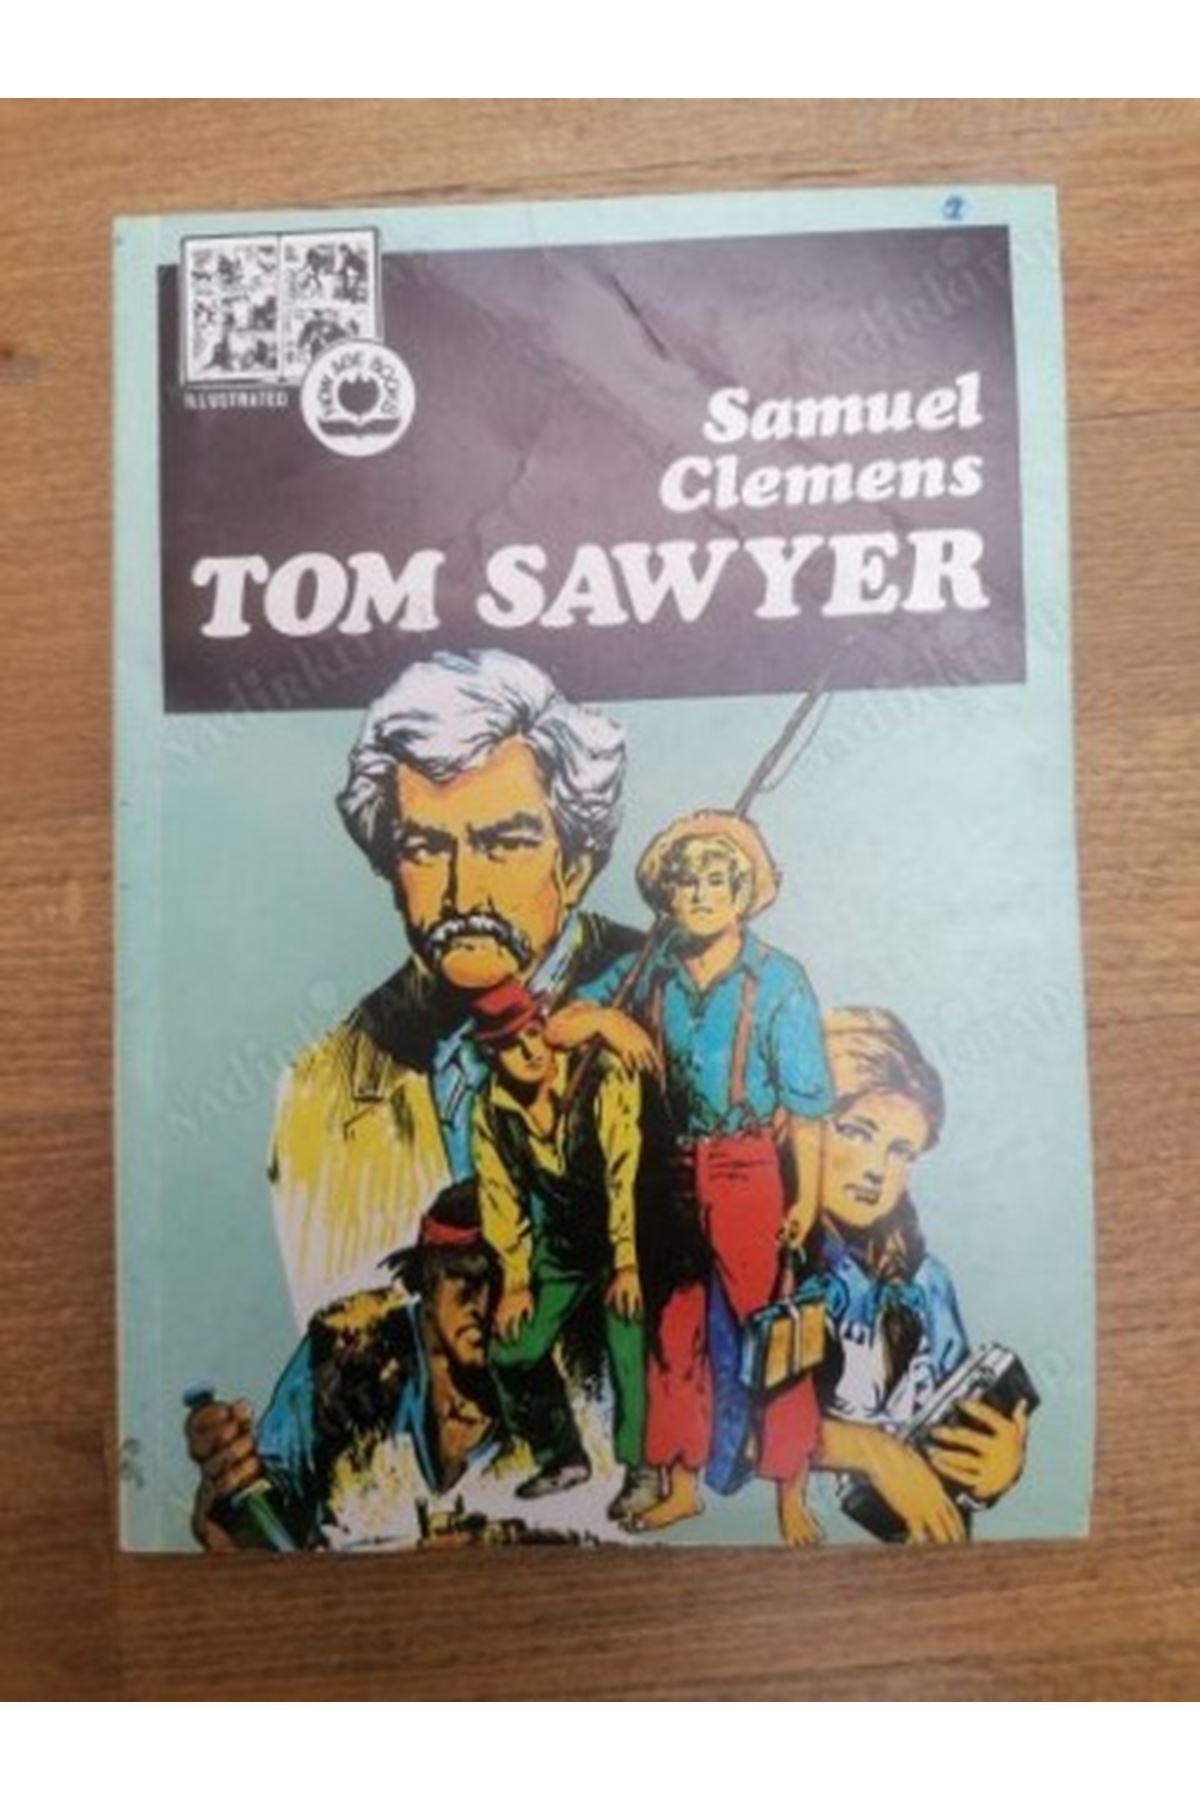 SAMUEL CLEMENS - TOM SAWYER